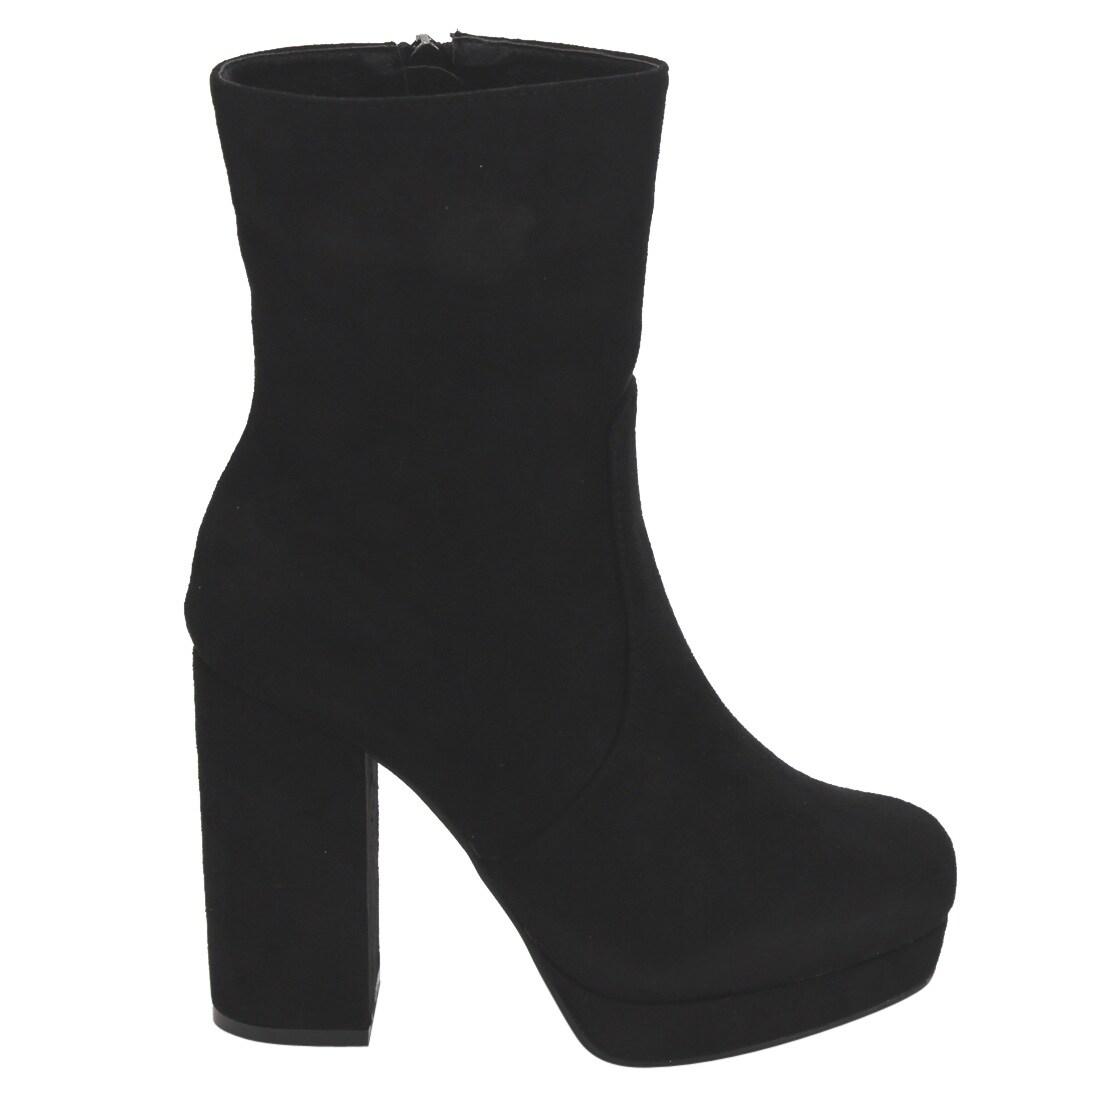 ab6ff72843b Beston EI87 Women's Side Zipper Wrapped Platform Chunky Heel Ankle Vegan  Booties